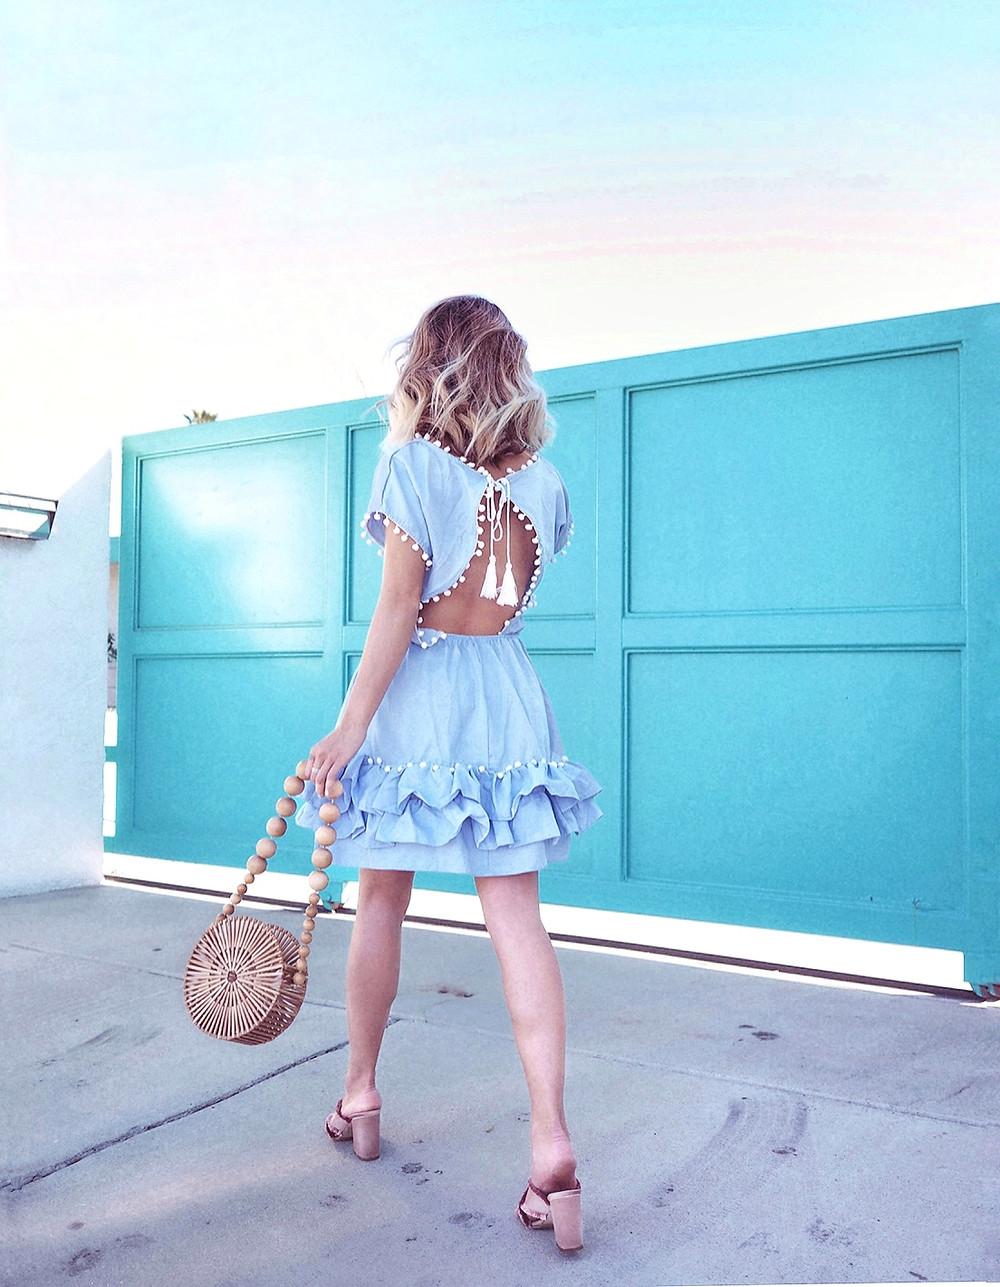 Peixoto Dress via Shopbop Sale   Lam in Louboutins